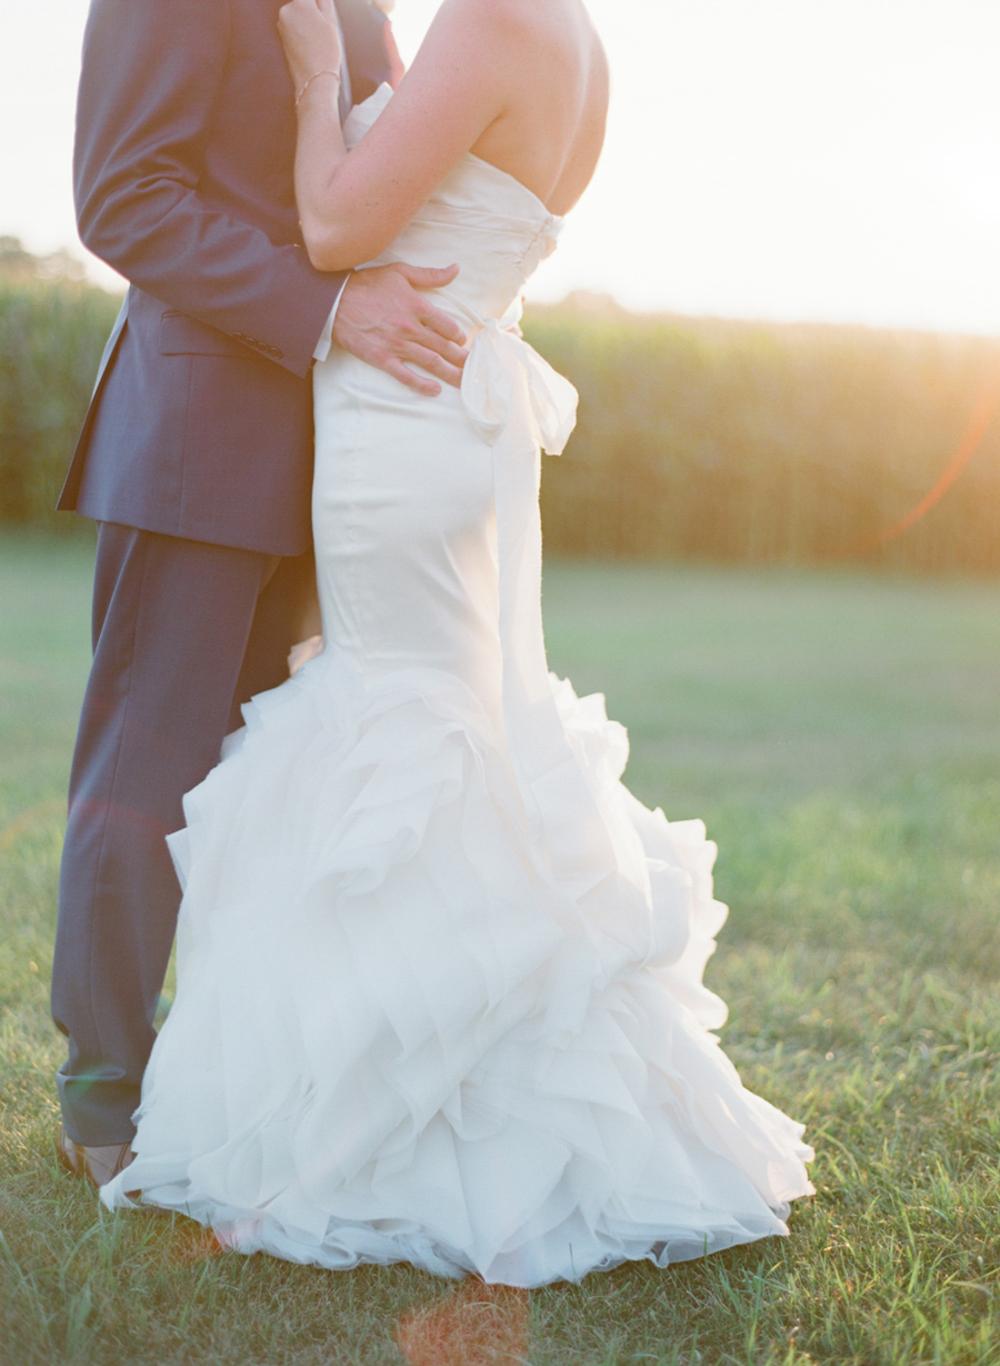 About_Thyme_Farm_Door_County_Wedding_056.jpg